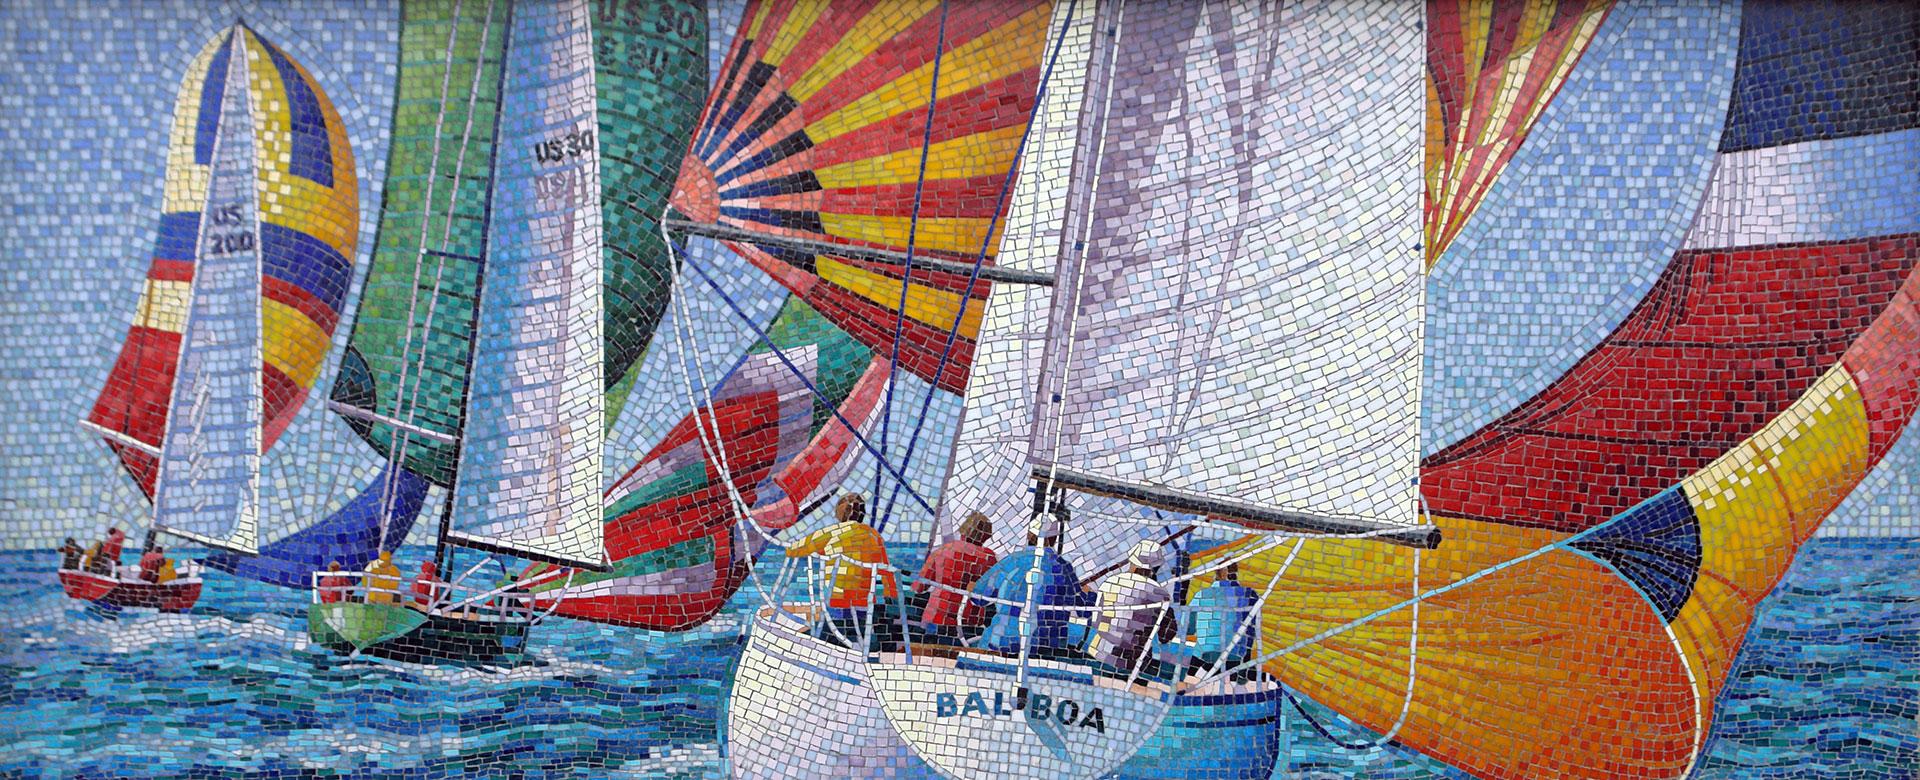 Newport Elementary Mural - Sailboats